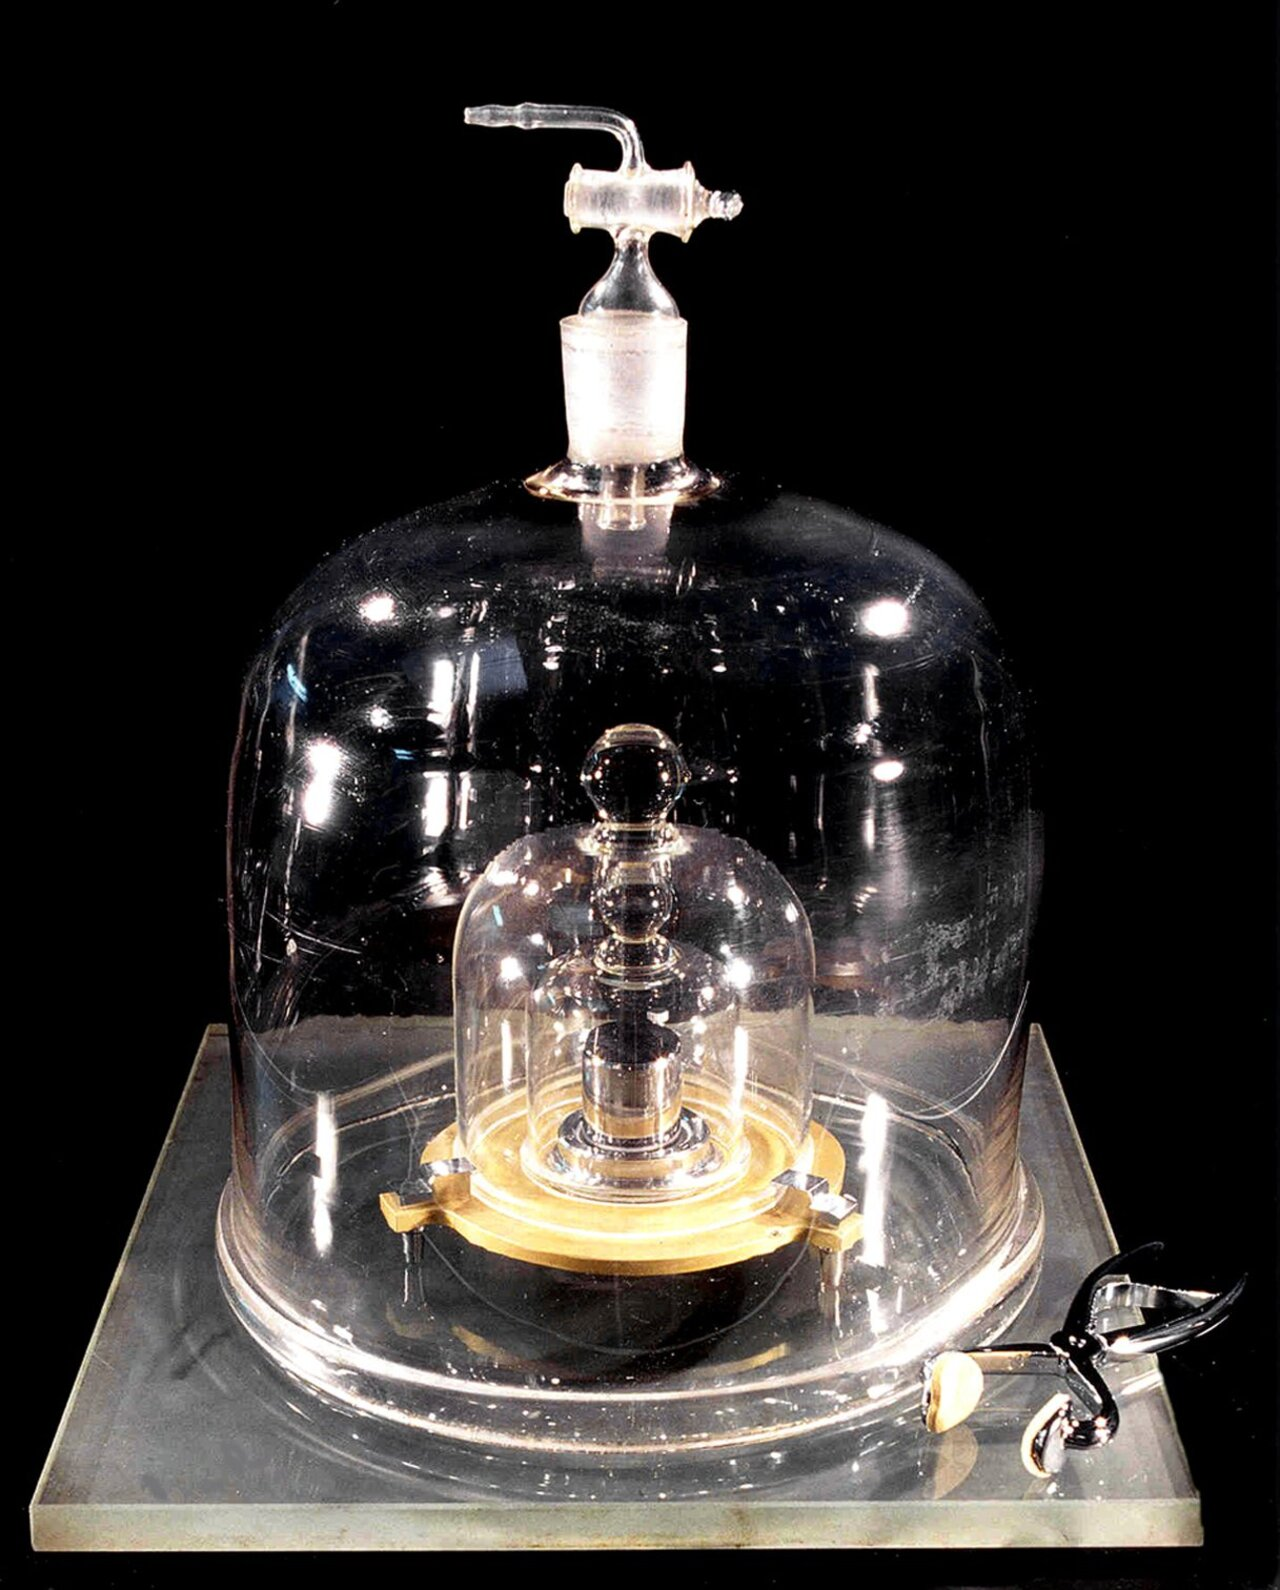 Quy chuẩn 1 kilogram (nguồn: NIST)